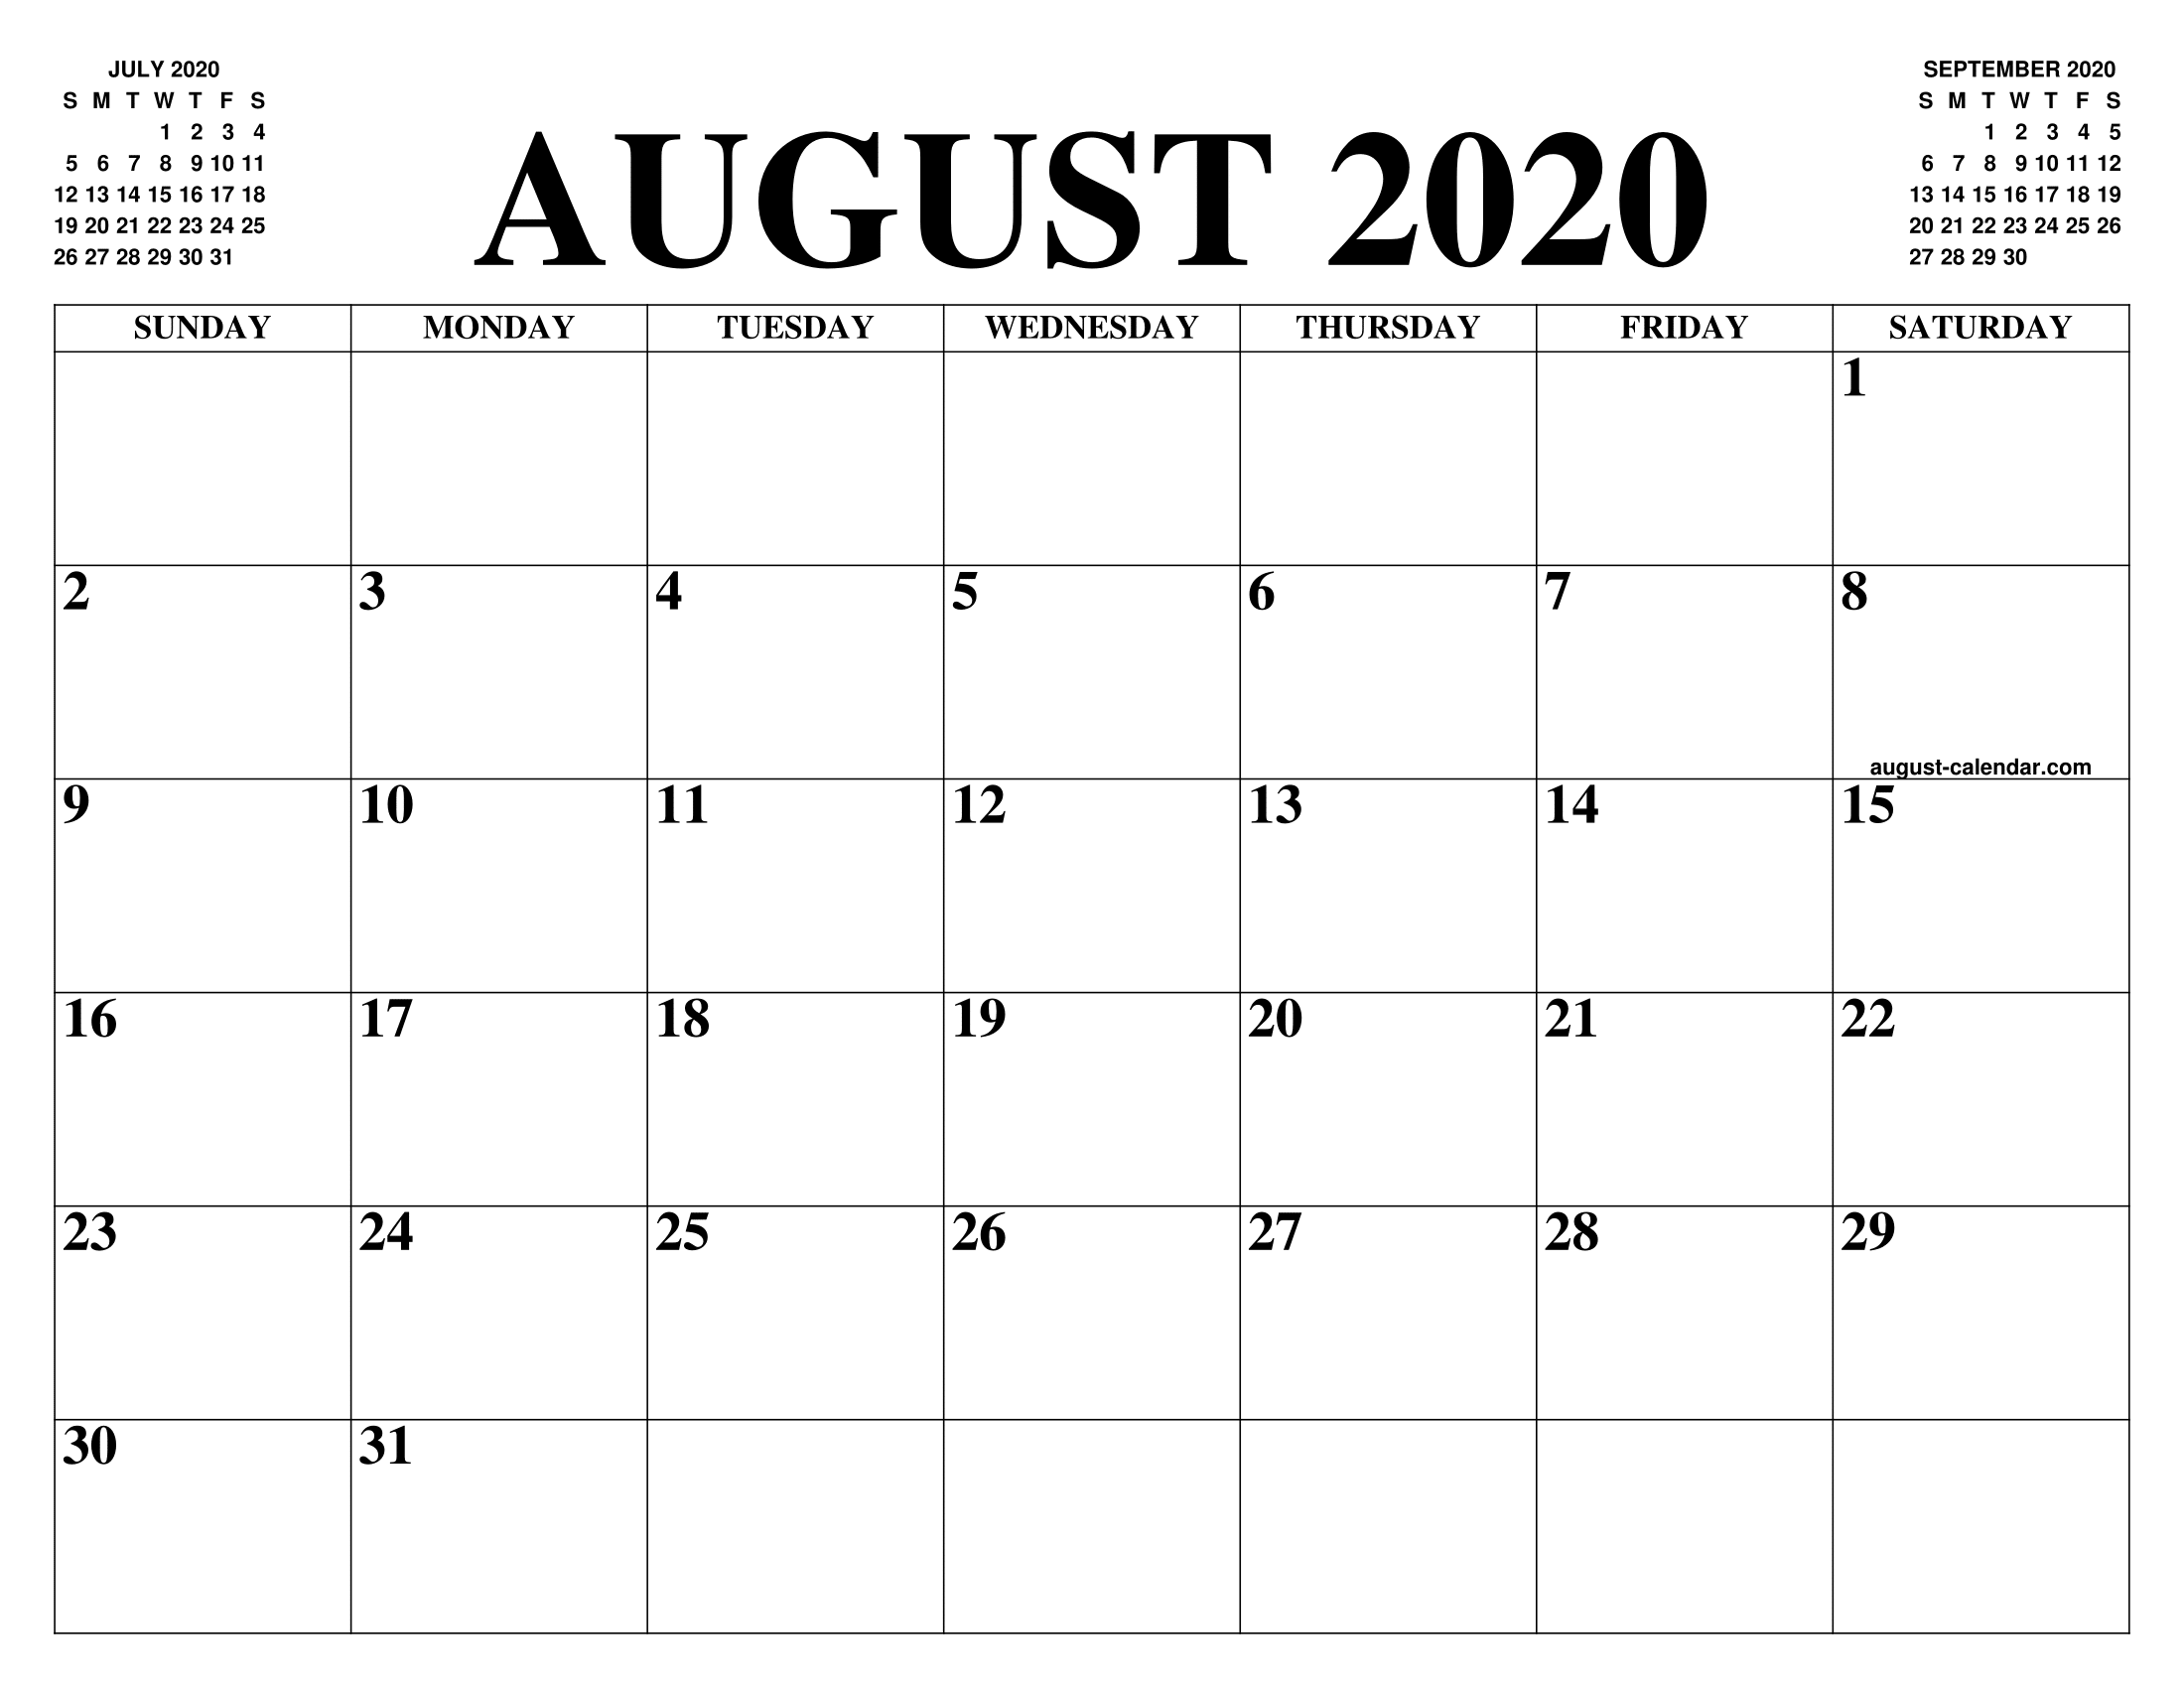 Calendar August 2020 Printable.August 2020 Calendar Of The Month Free Printable August Calendar Of